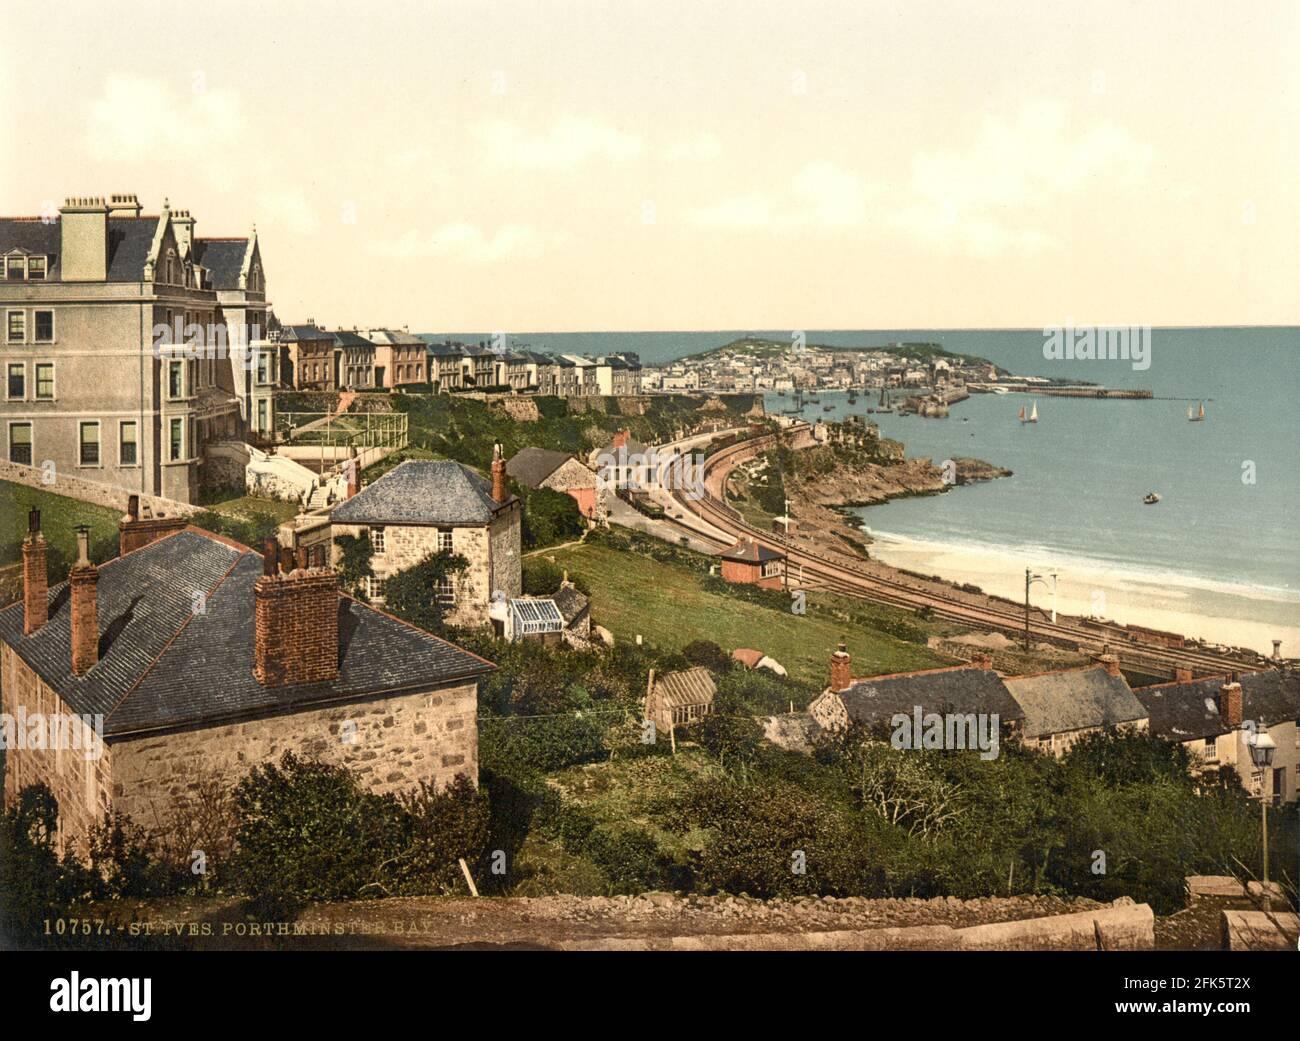 Porthminster Bay St Ives en Cornwall alrededor de 1890-1900 Foto de stock